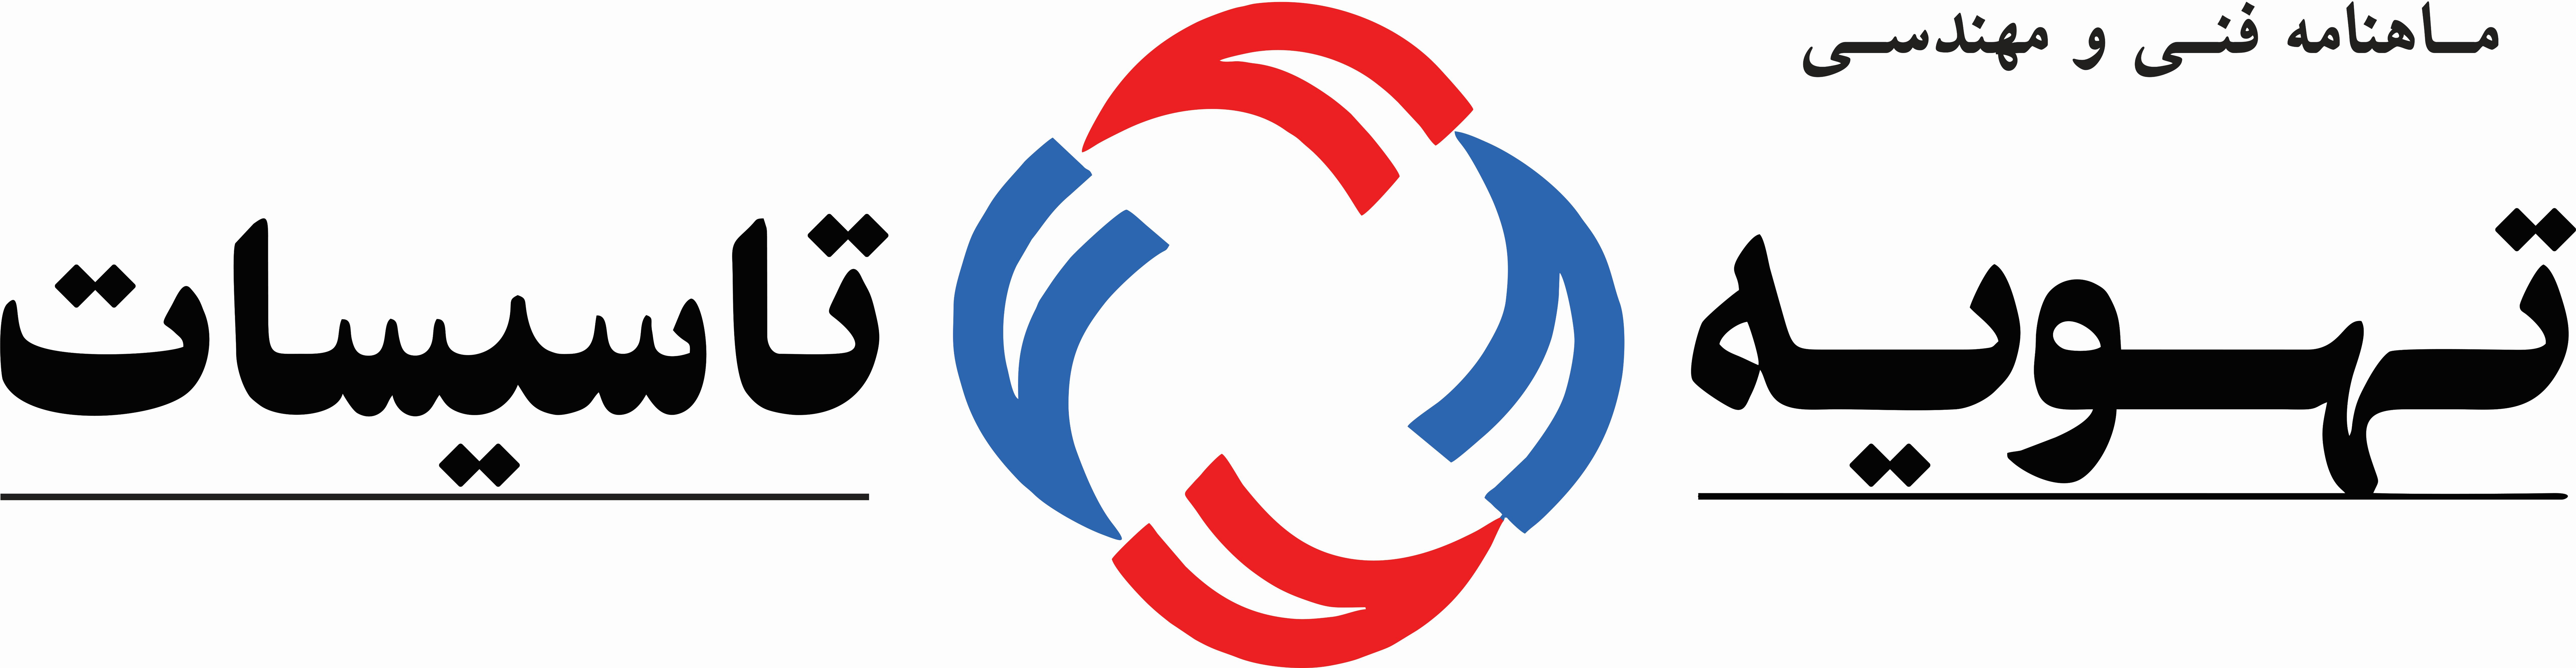 بانک اطلاعات صنعت تهویه و تاسیسات ایران